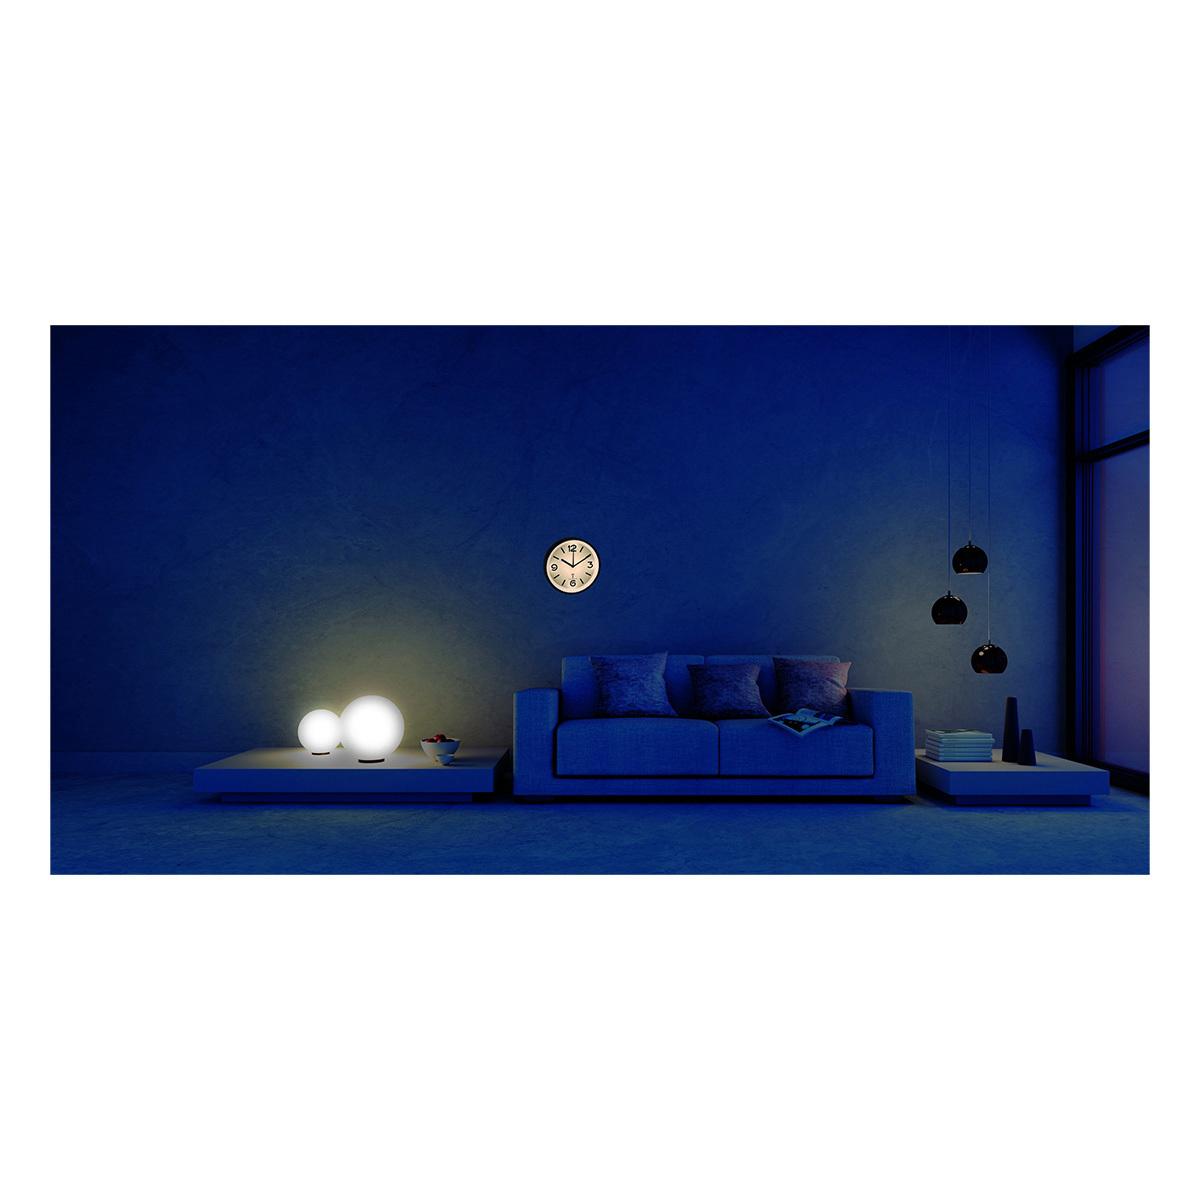 60-3535-02-analoge-funk-wanduhr-mit-nachtbeleuchtung-beleuchtung-1200x1200px.jpg